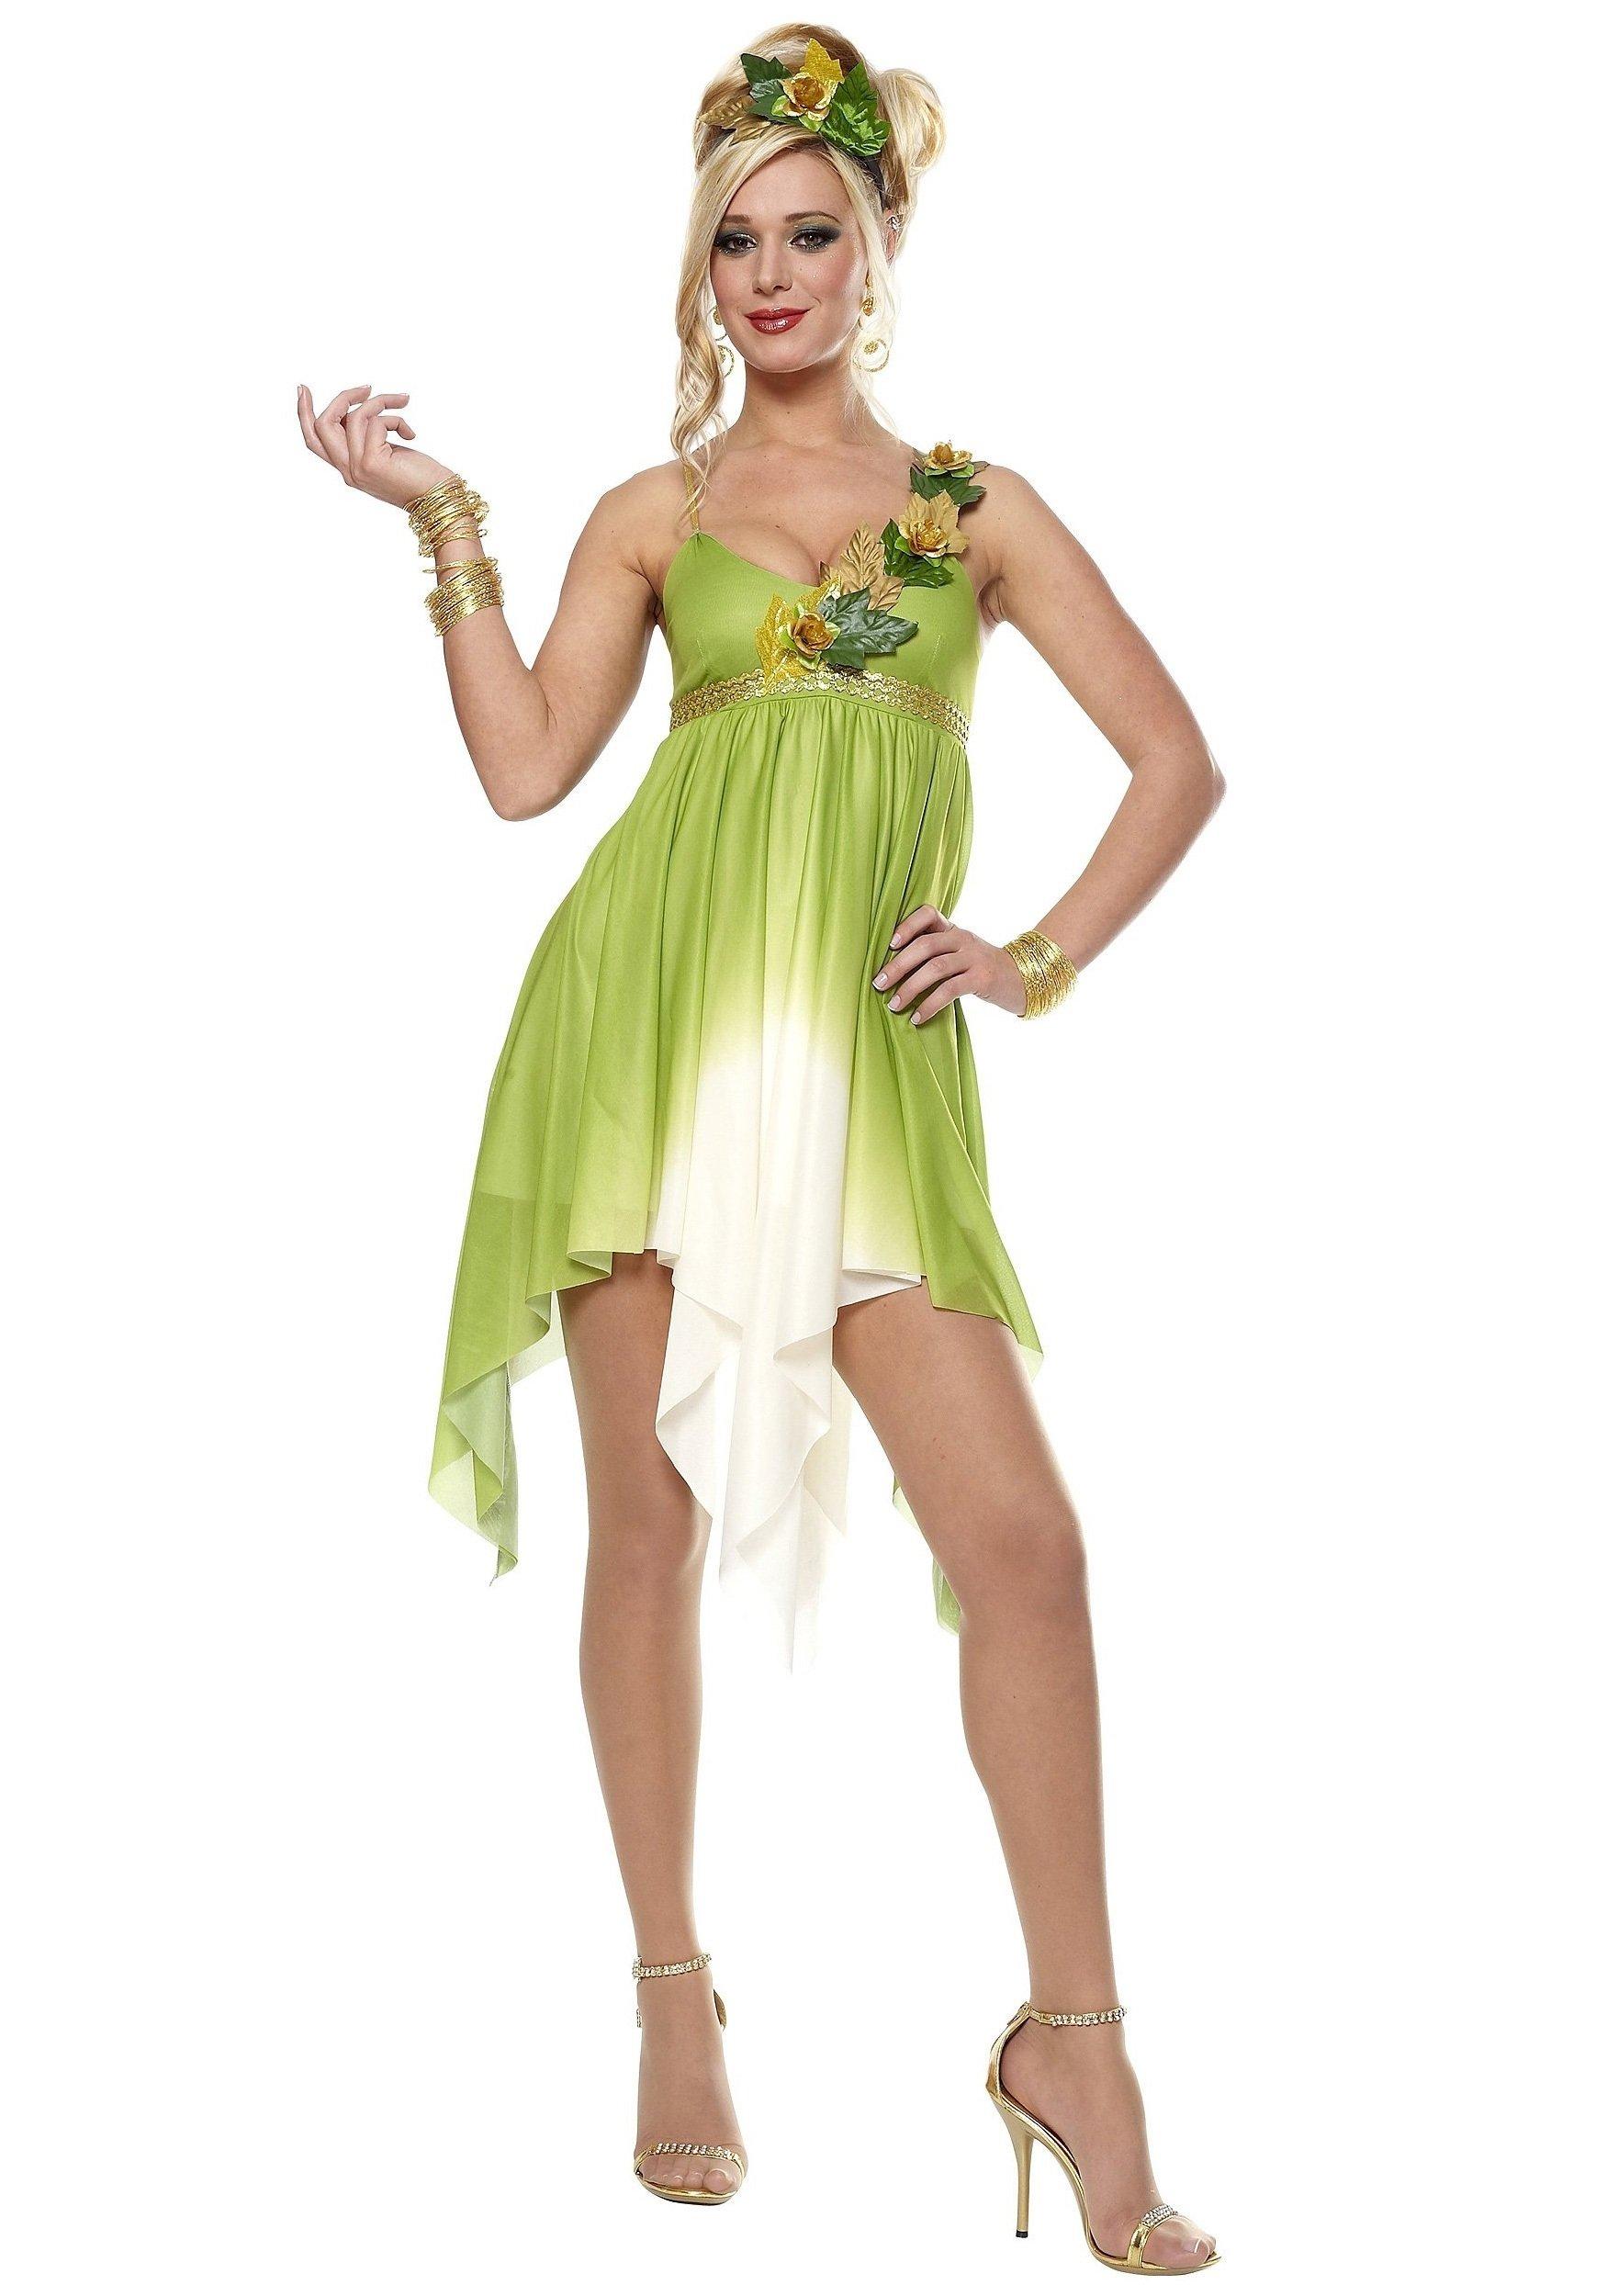 10 Best Mother Nature Halloween Costume Ideas